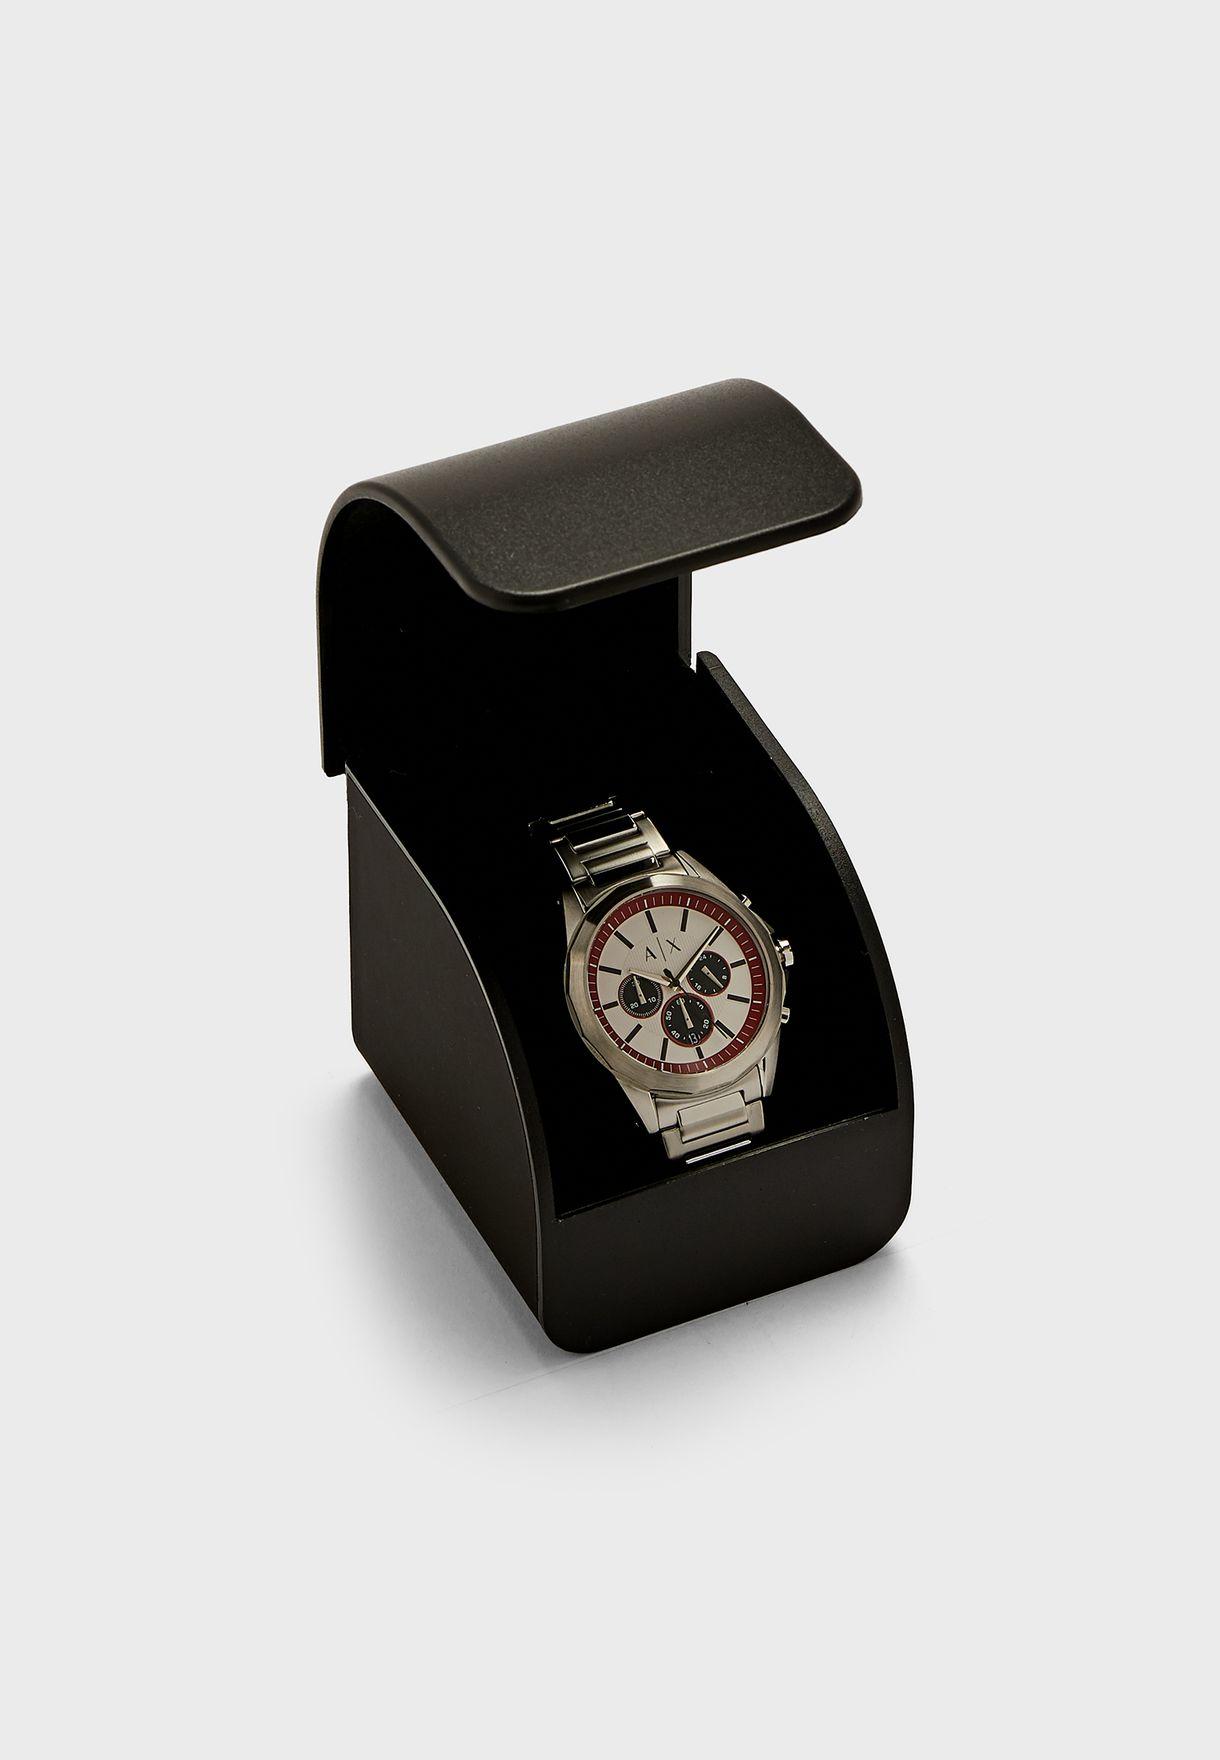 Chronograph Analog Watch